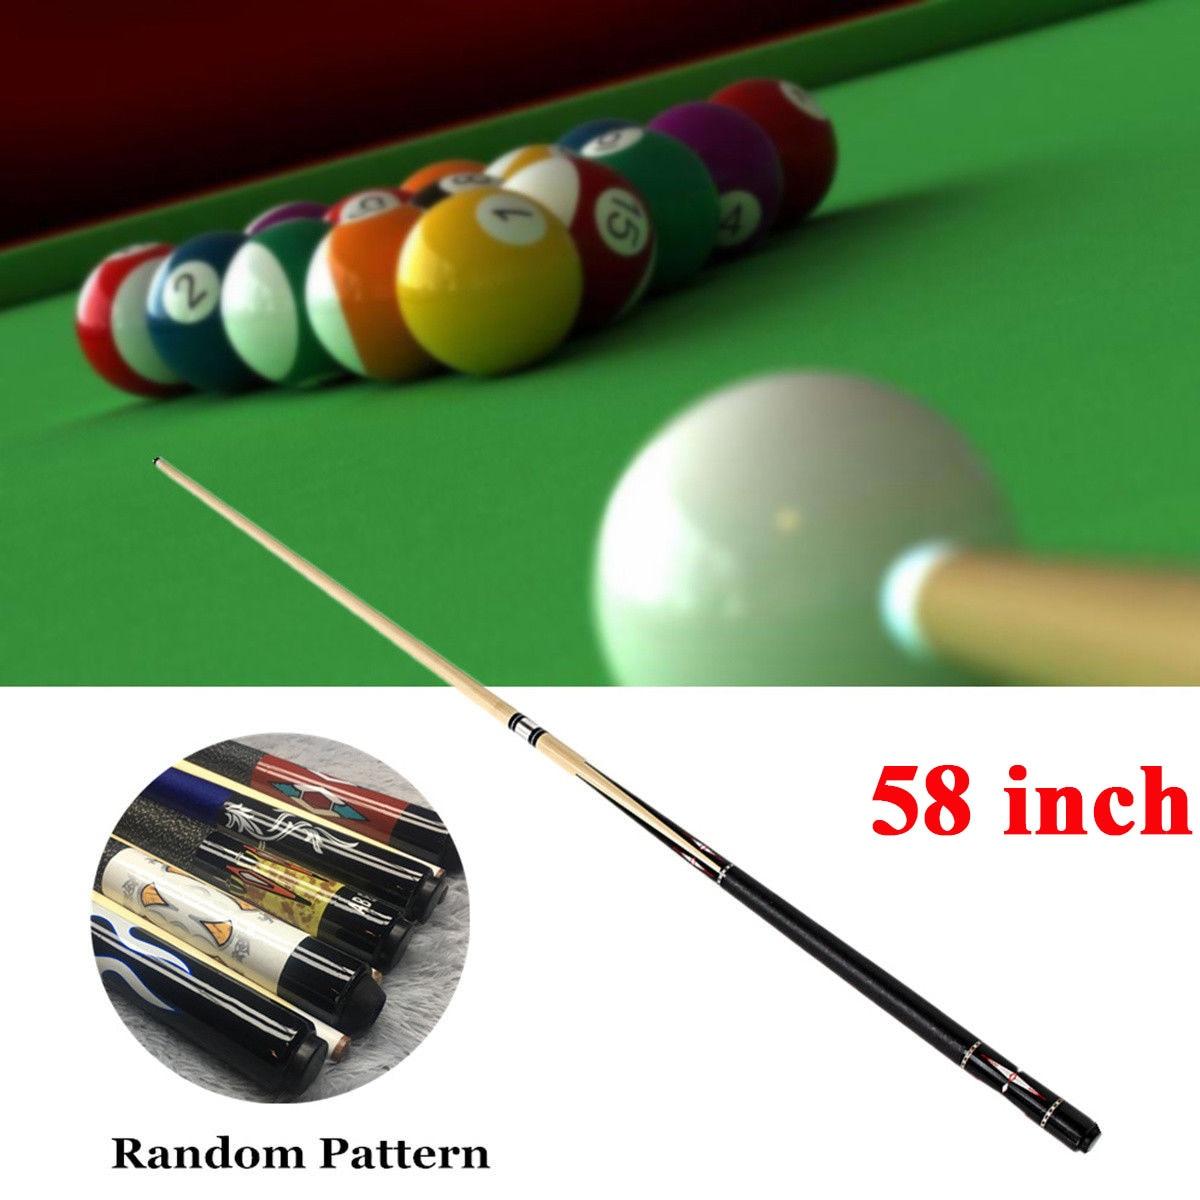 Pool Cue New 58